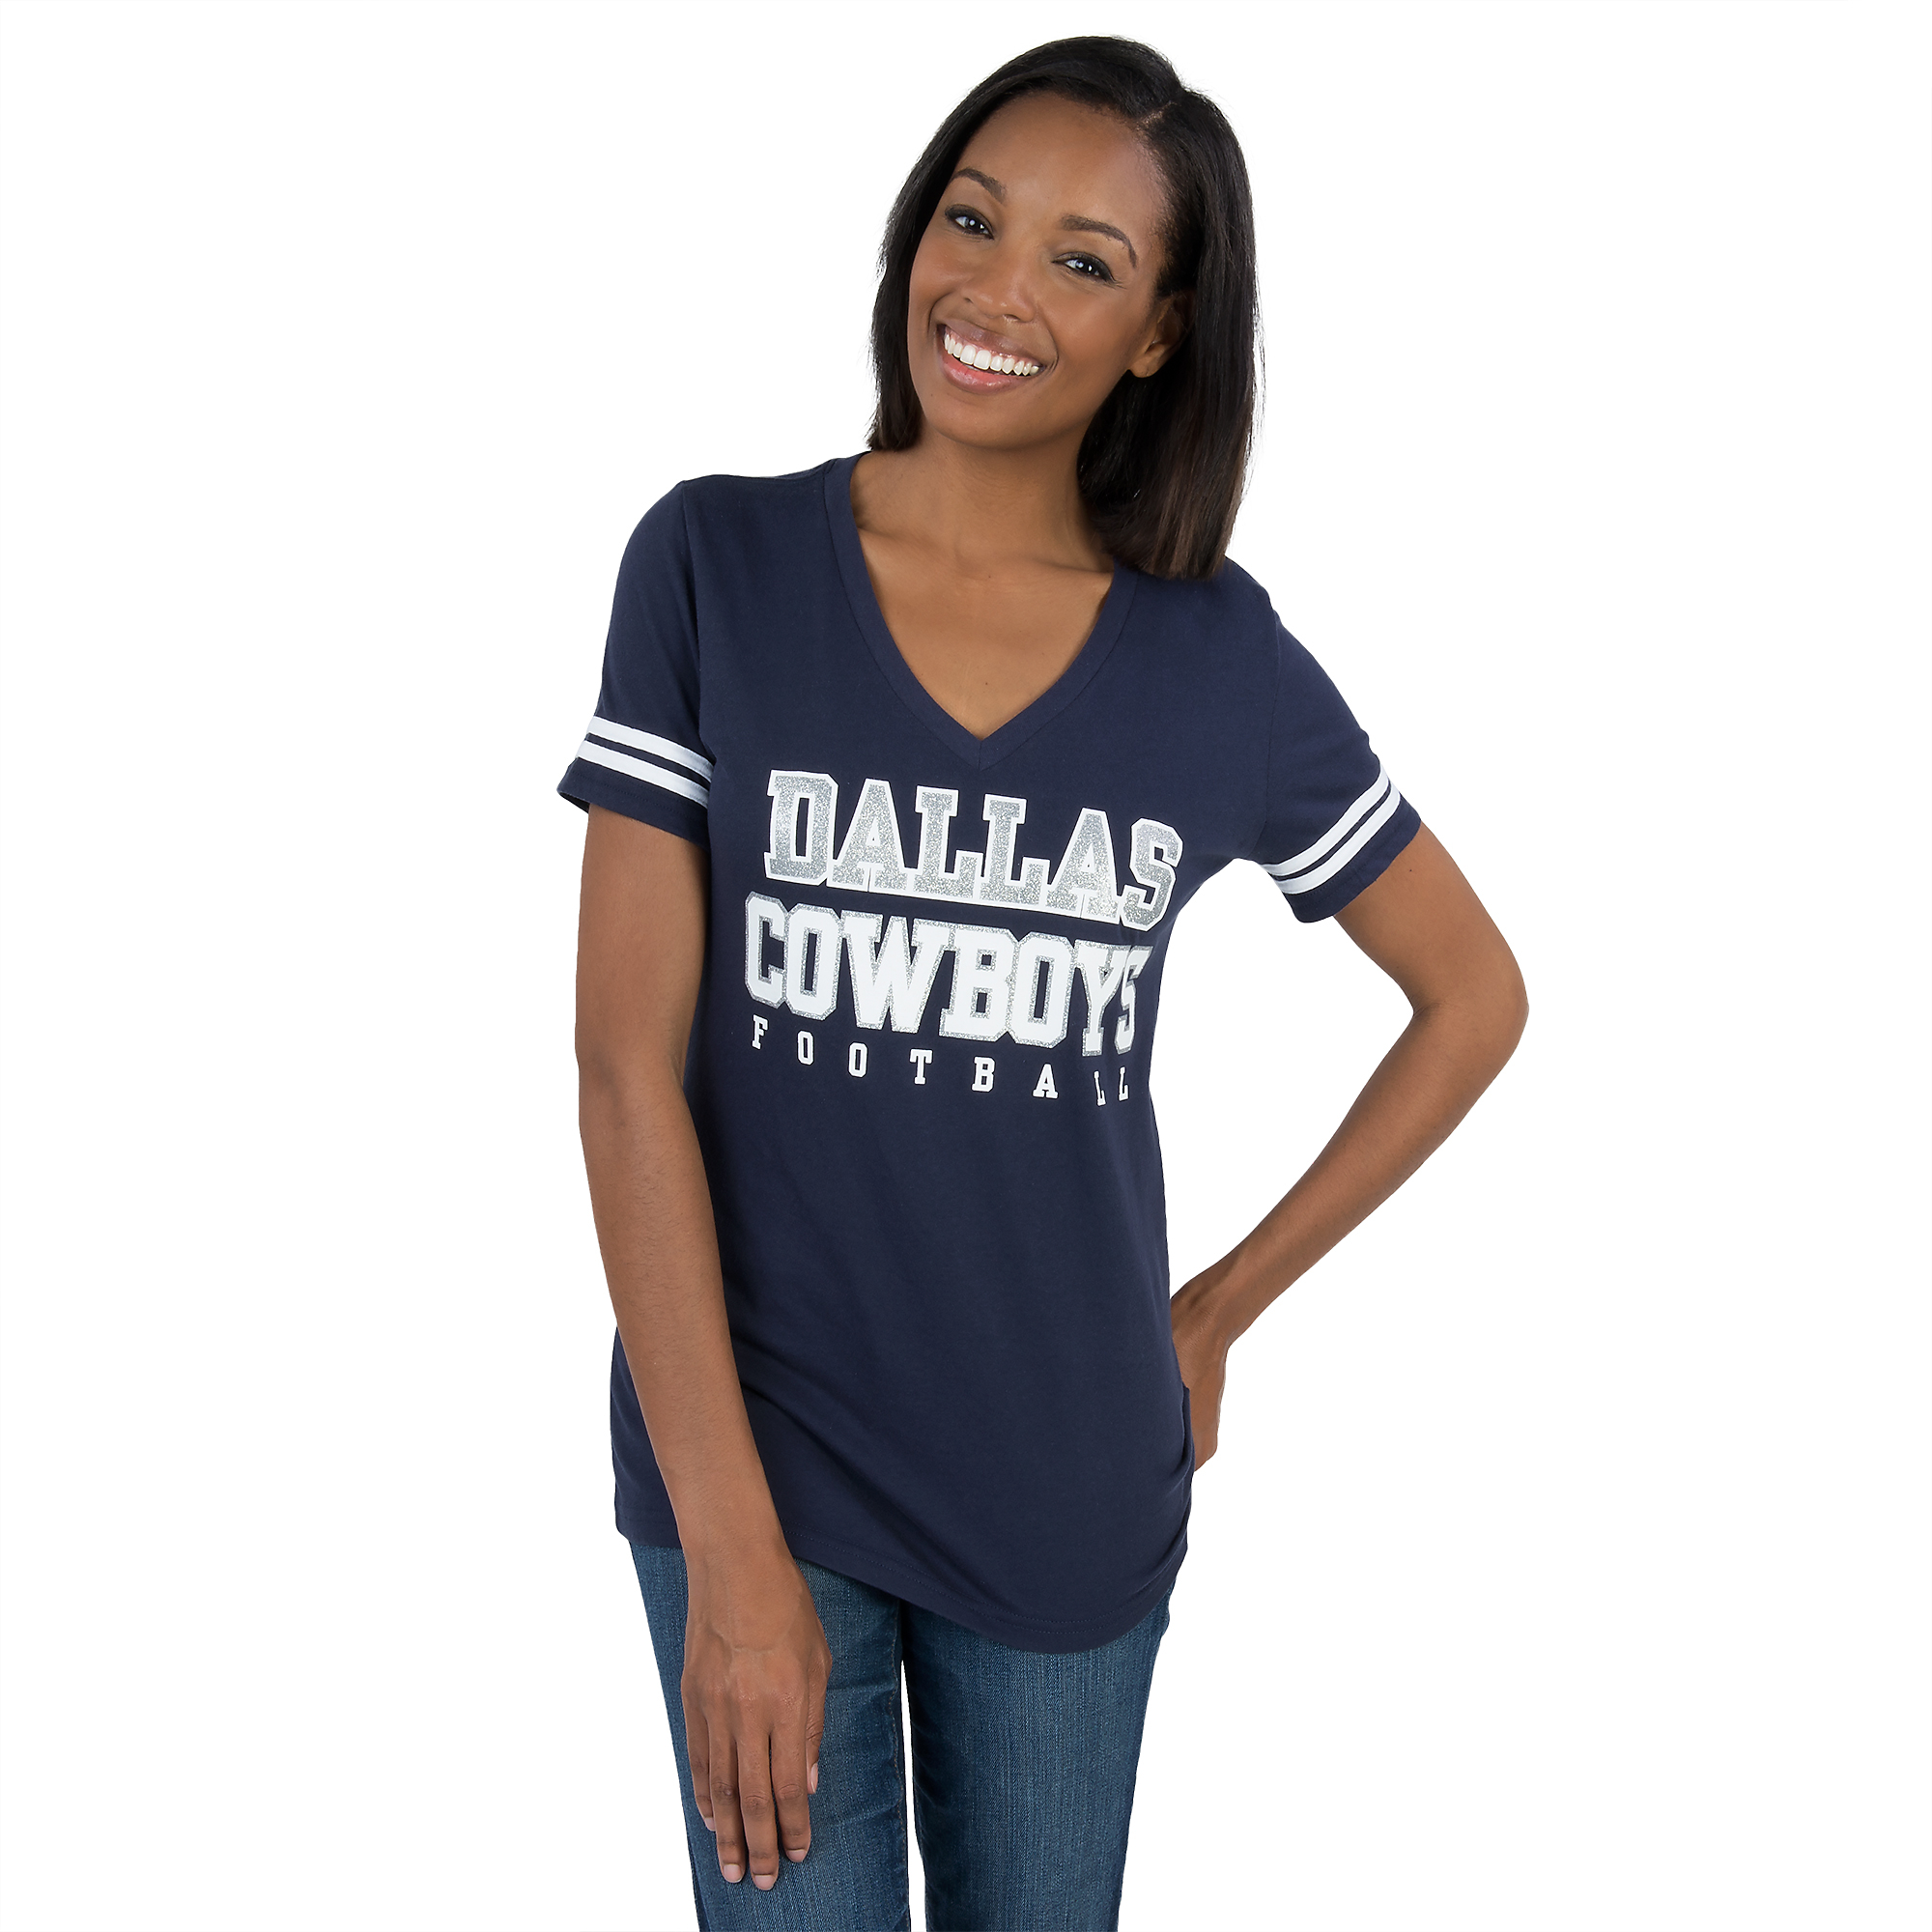 9567bb96 Dallas Cowboys Womens Glitter Practice Short Sleeve Tee   Fans United